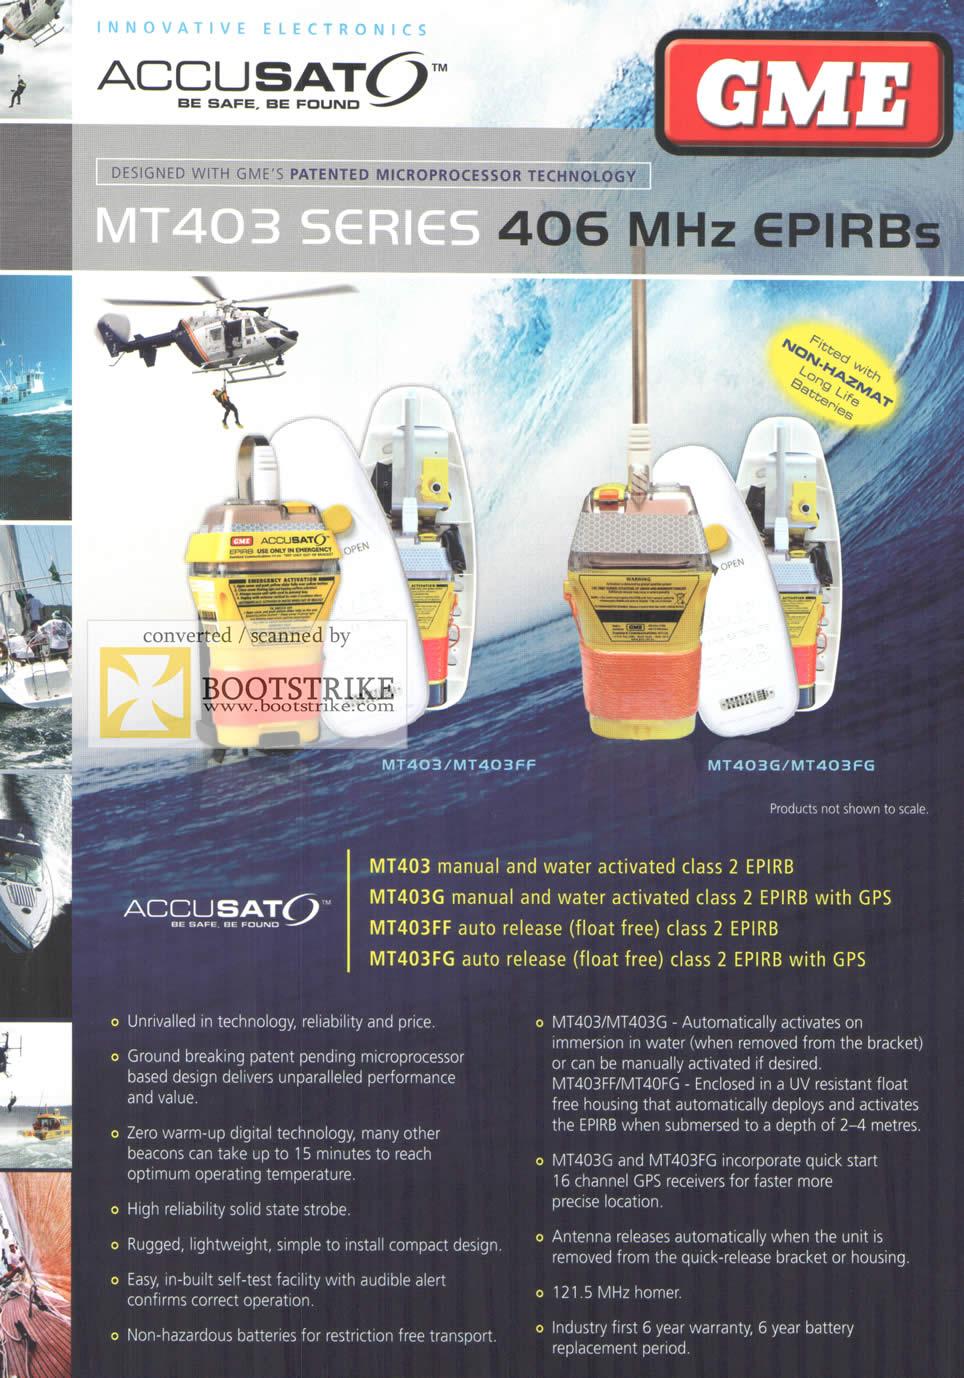 Comex 2009 price list image brochure of Accusat EPRIB MT403 MT403FF MT403G MT403FG